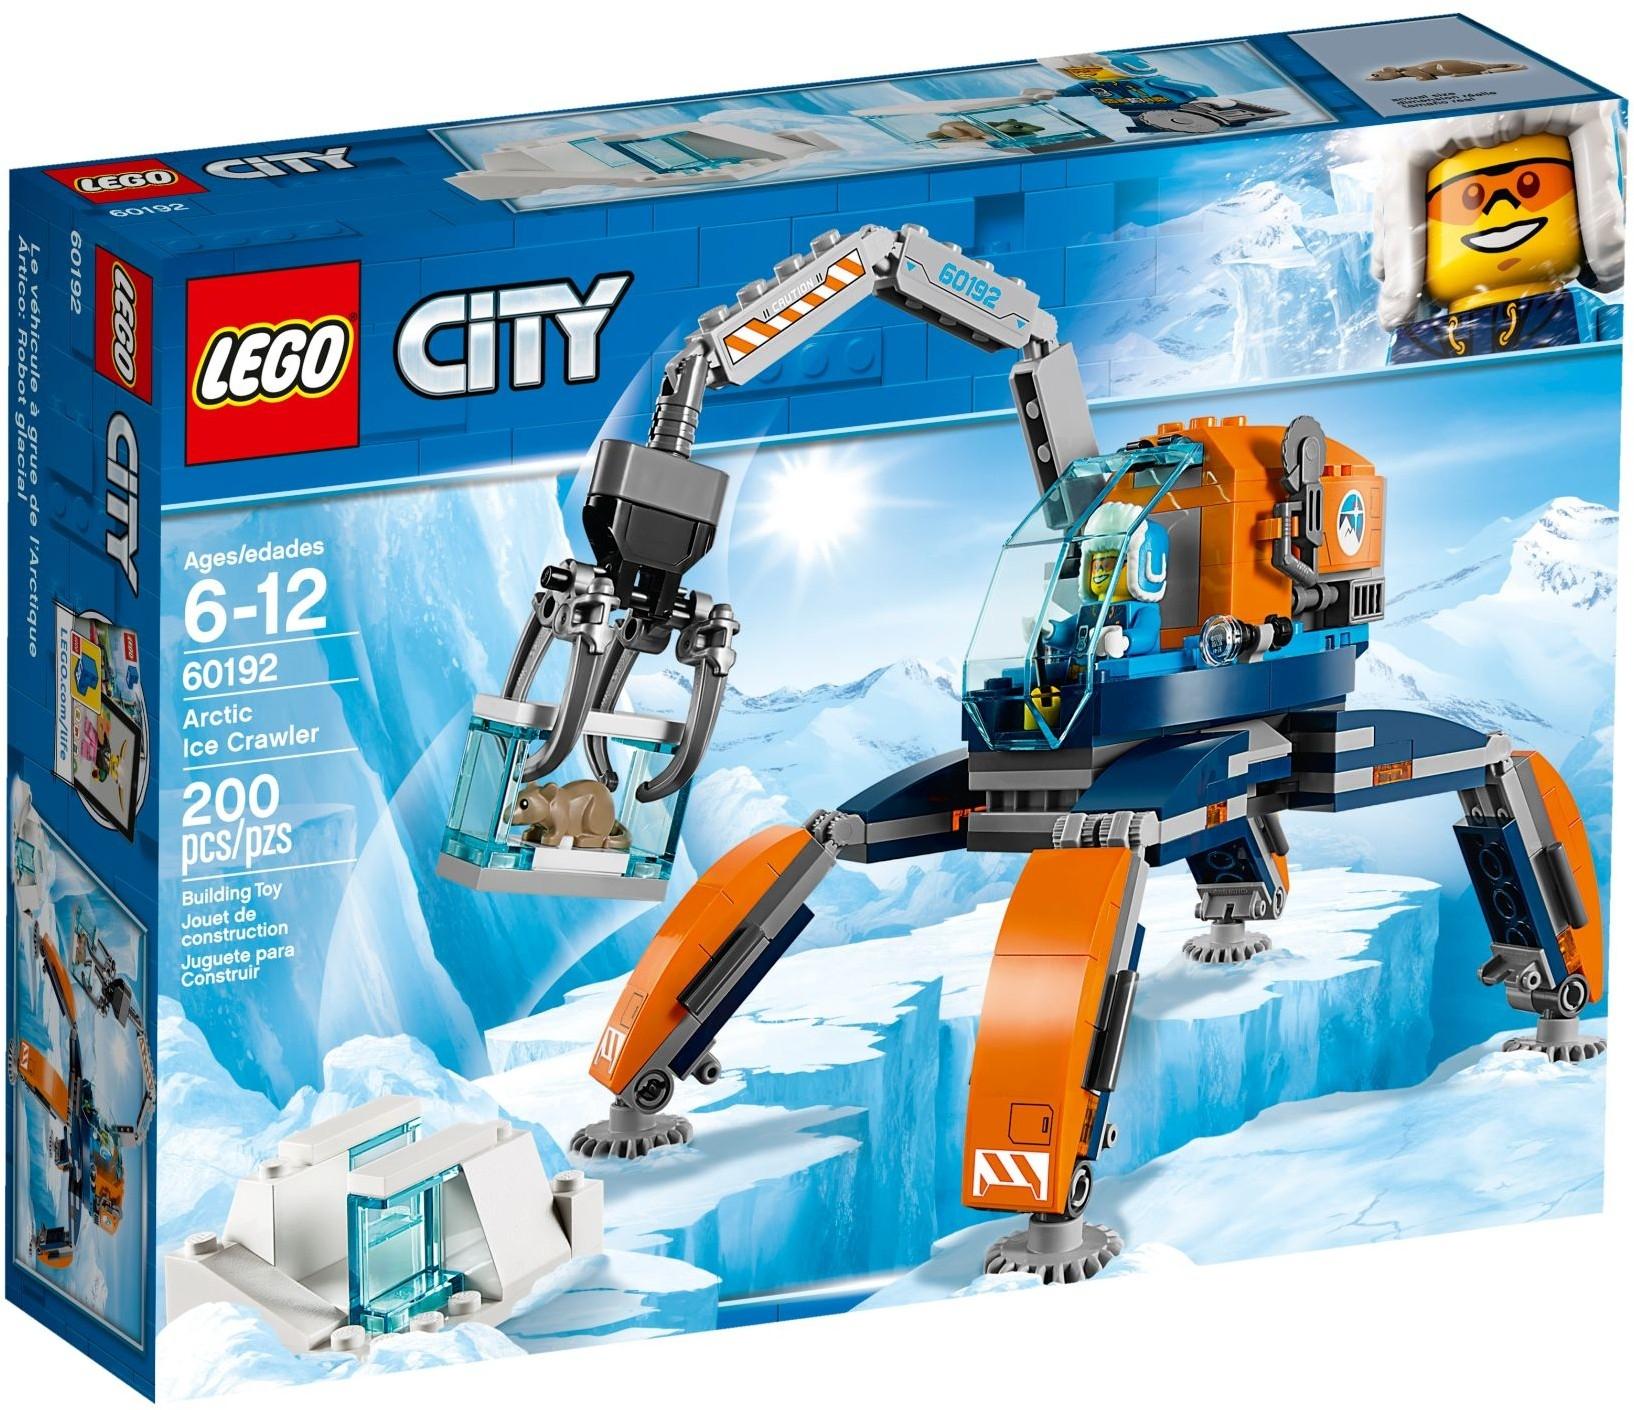 Lego City 60192 Arctic Ice Crawler Bott Funko Pop Bvs Aquaman Blue Ie